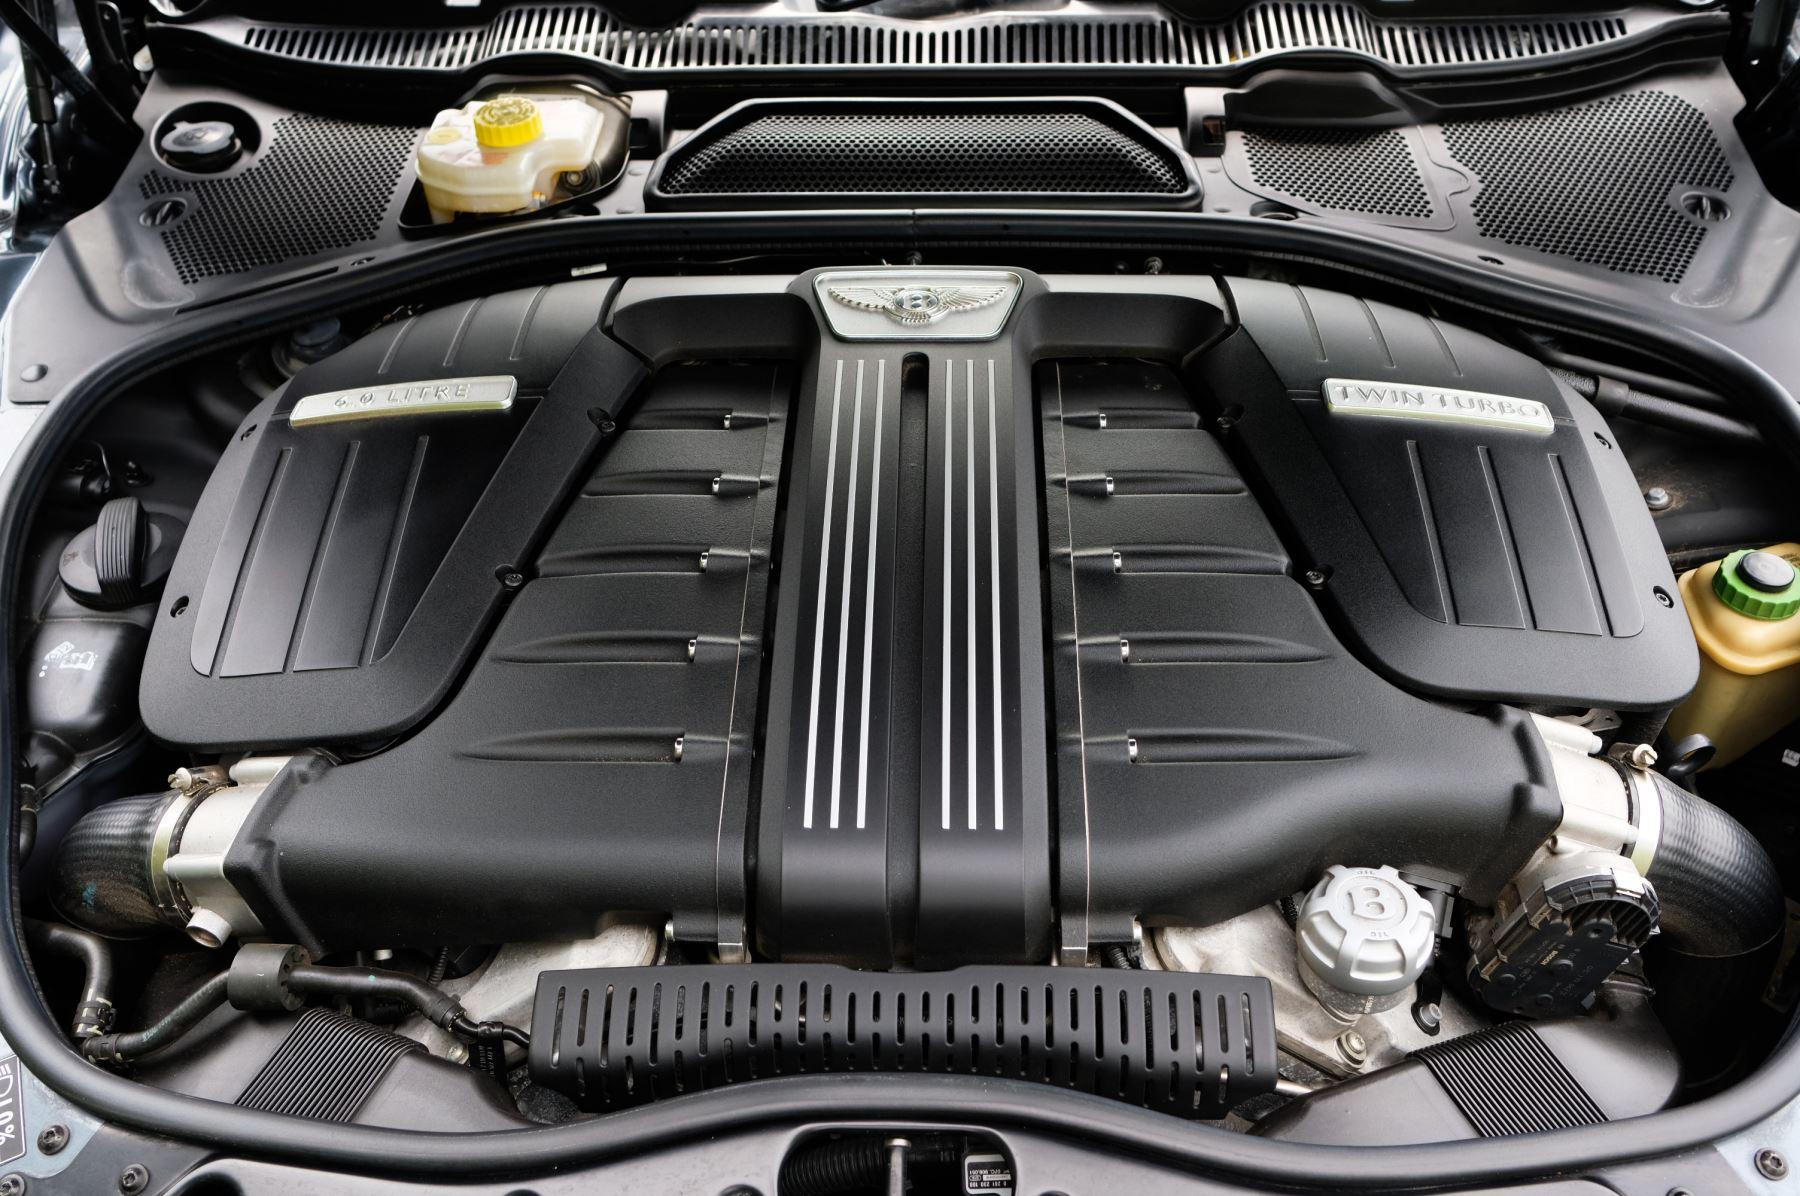 Bentley Continental GTC 6.0 W12 Speed - Massage Seats & Ventilation - Neck Warmer - Rear View Camera image 16